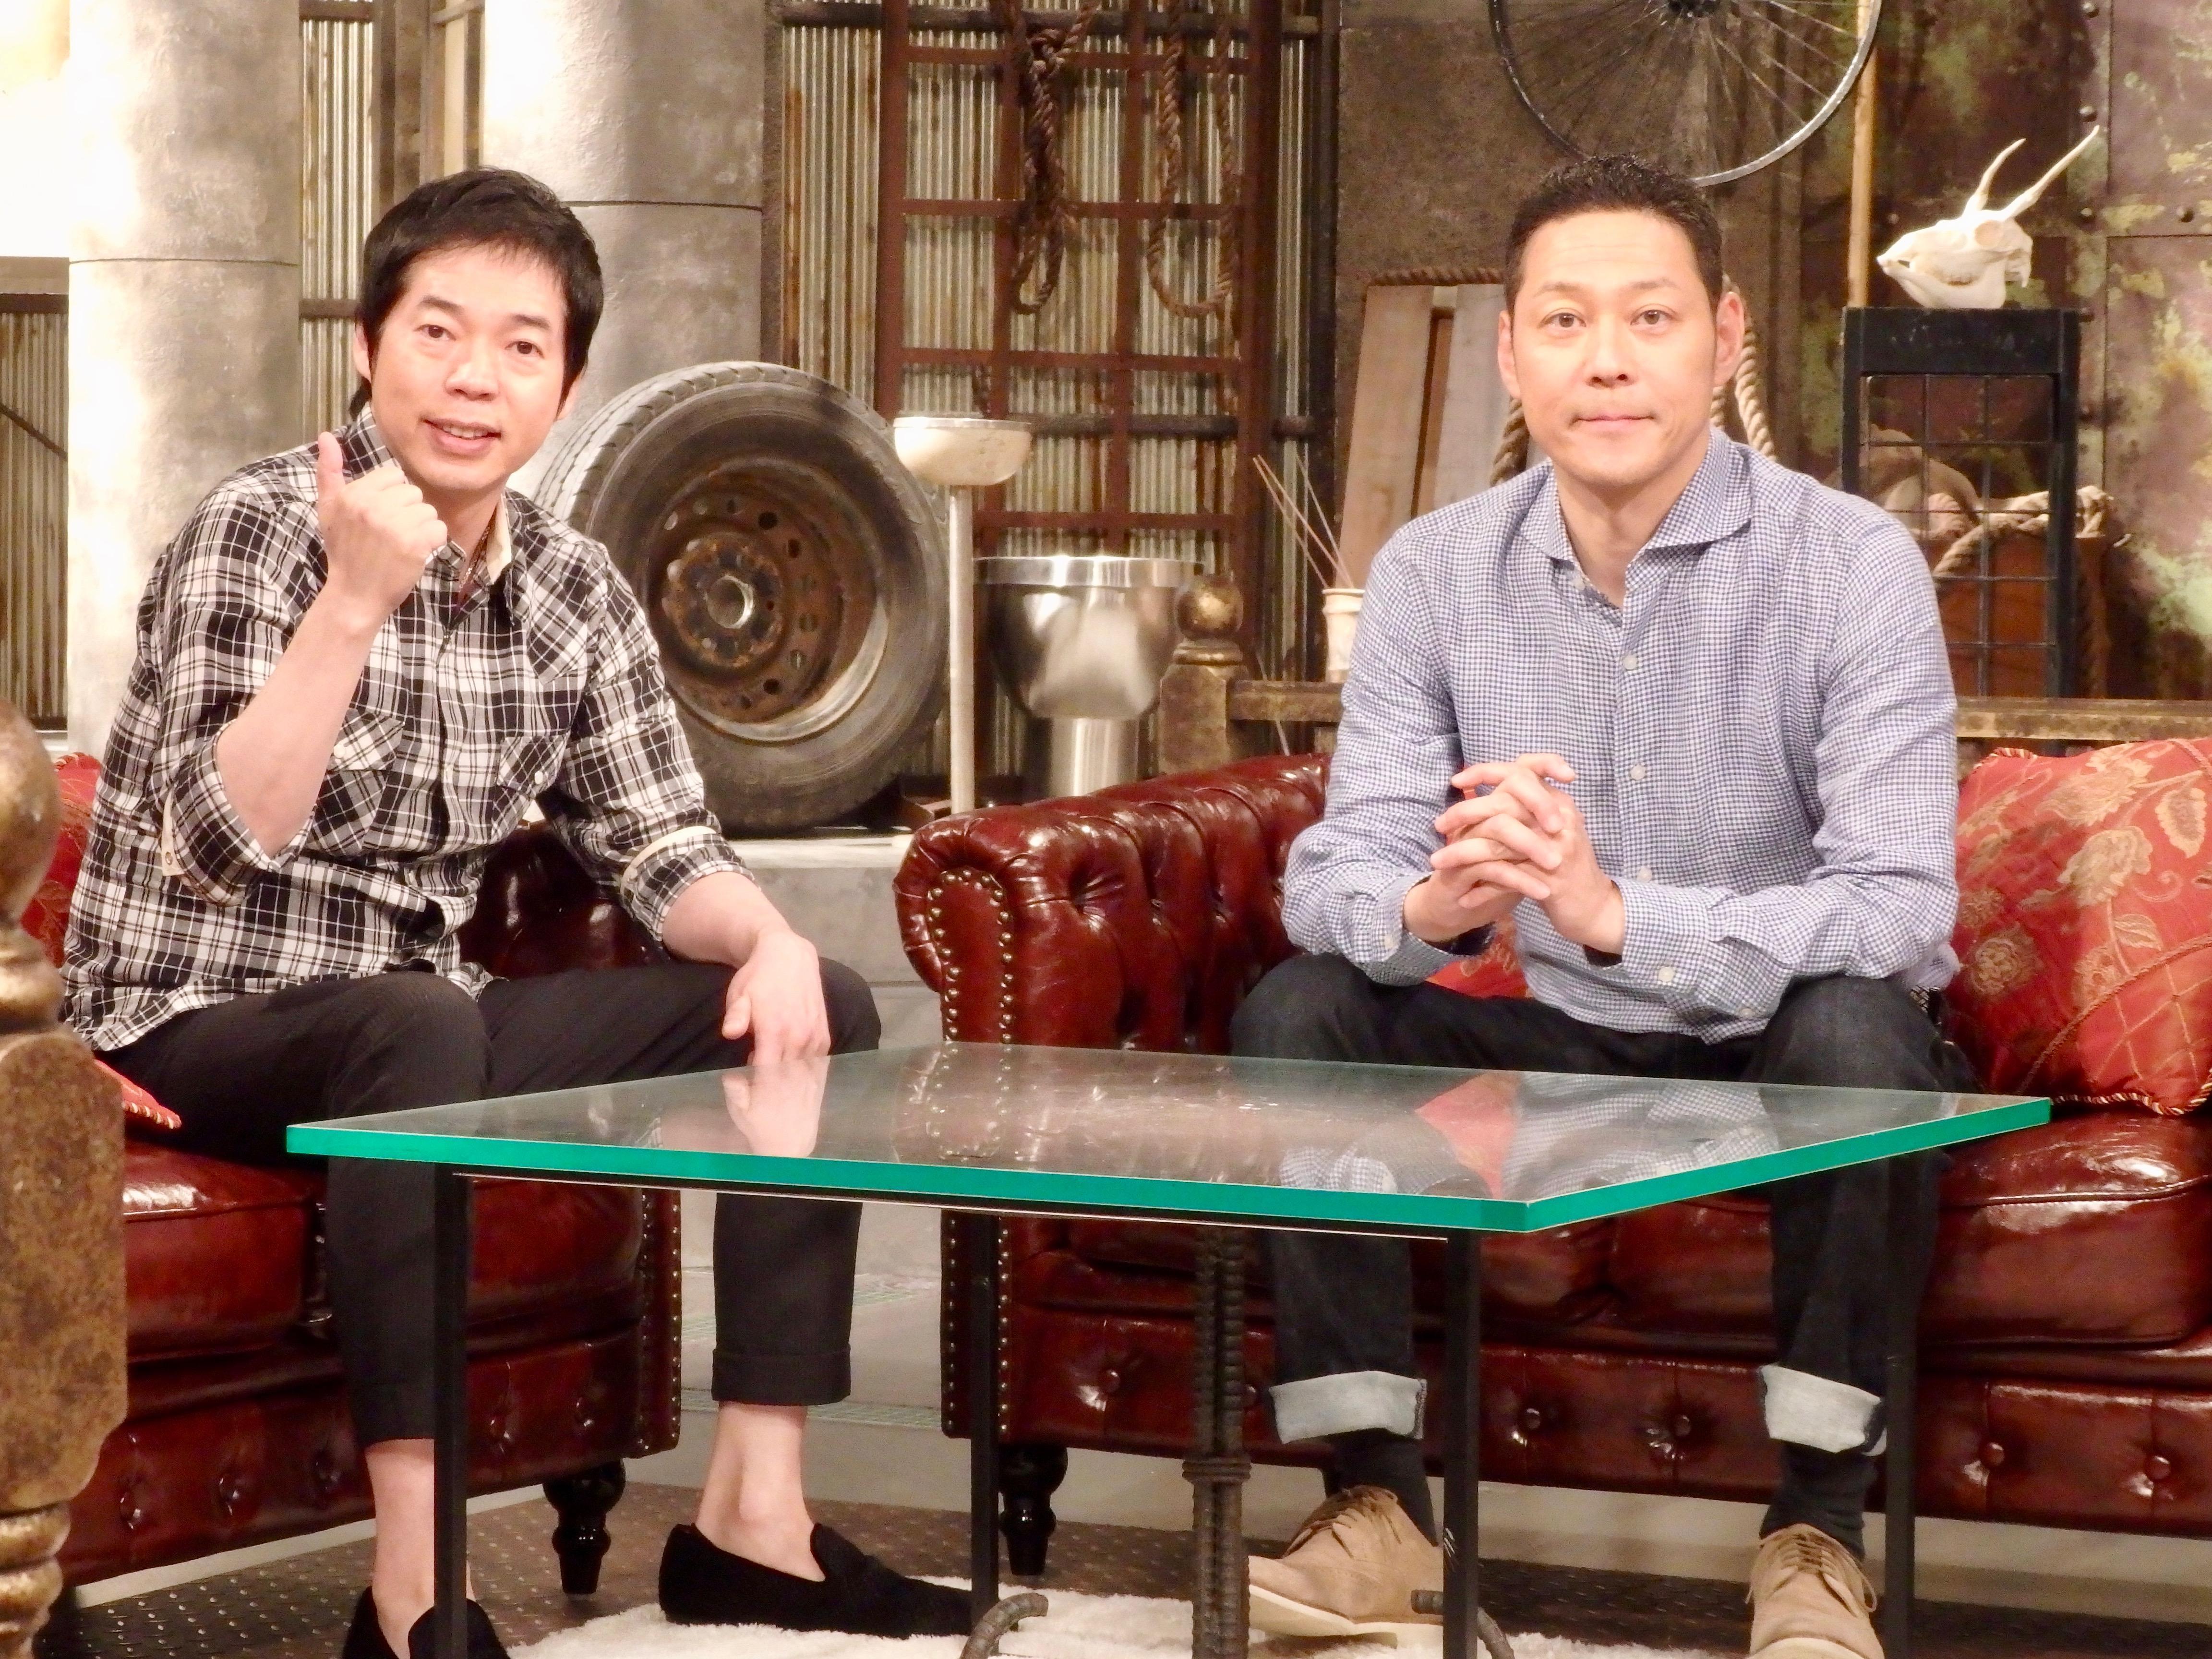 http://news.yoshimoto.co.jp/20170608182813-084e4fed908a5f03174788c3986d76df5ab83345.jpg